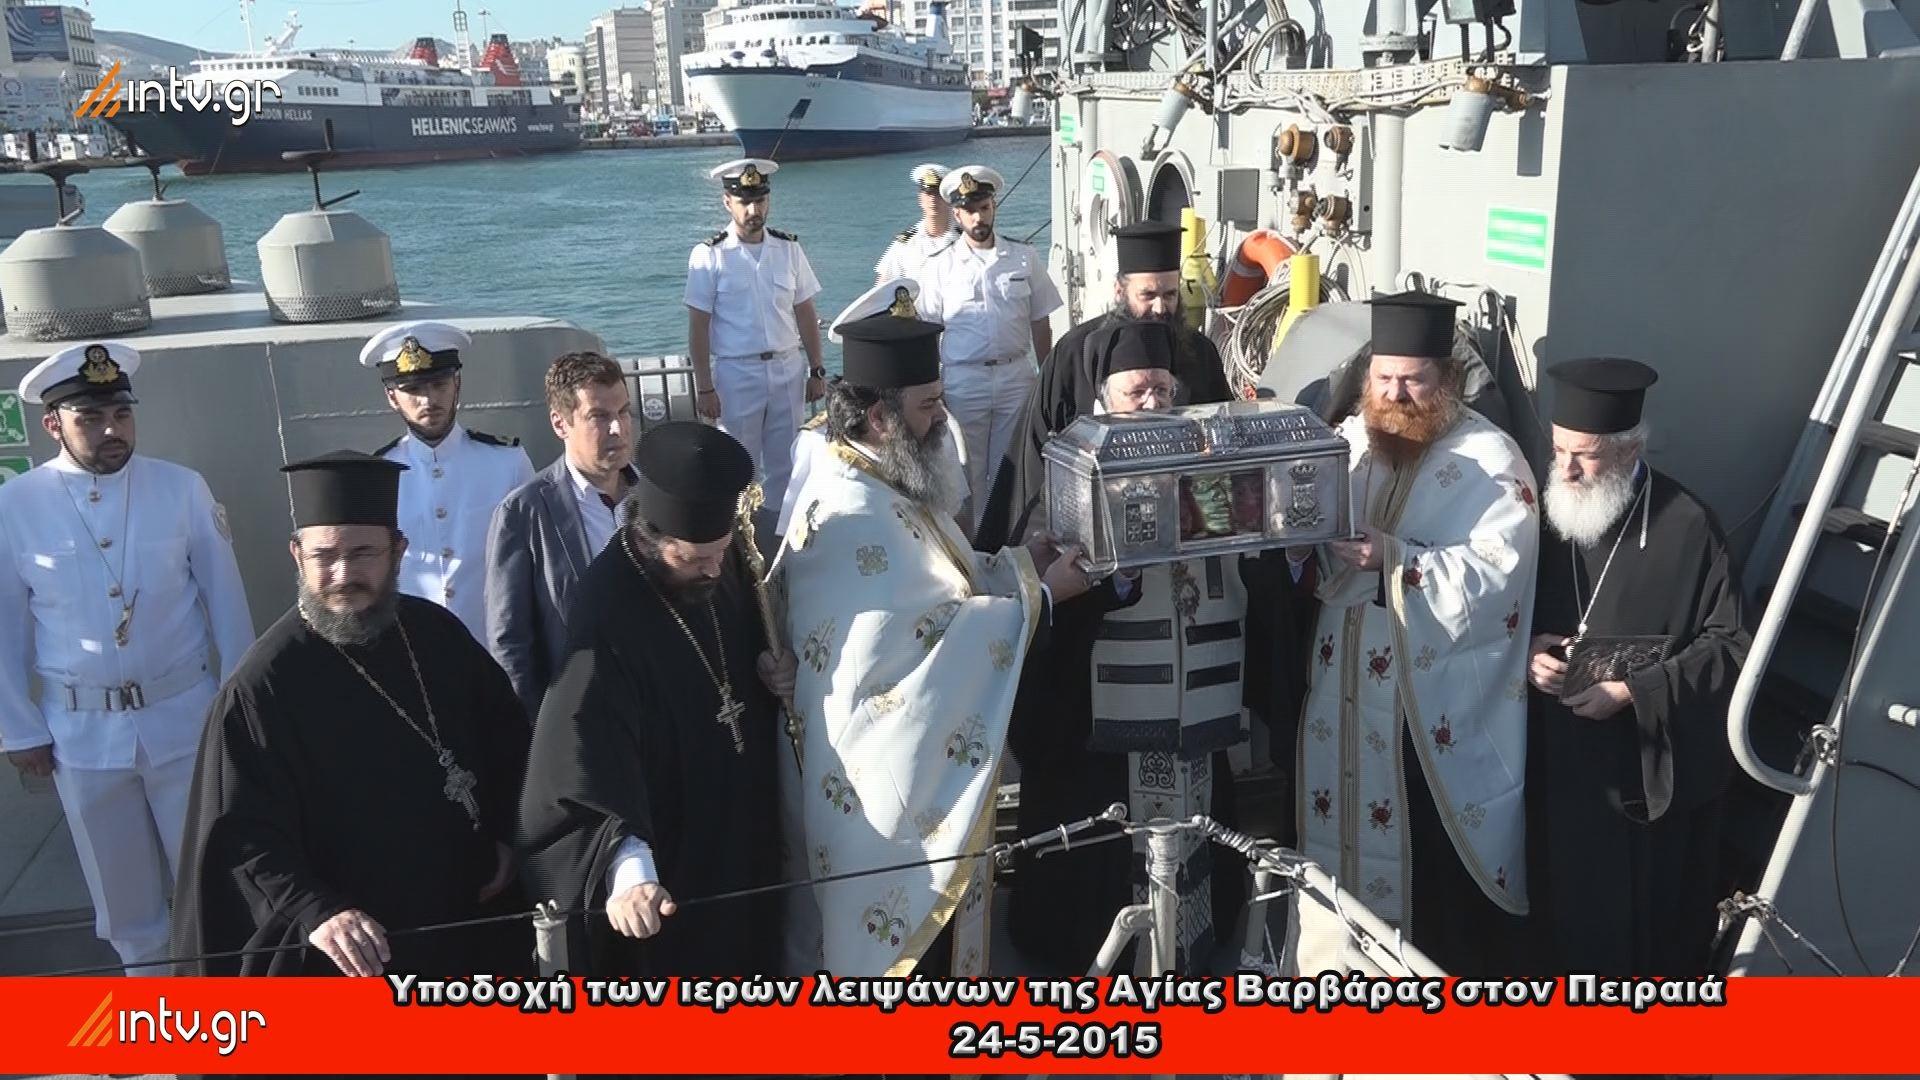 Yποδοχή των Ιερών Λειψάνων της Αγίας Βαρβάρας στον Πειραιά.